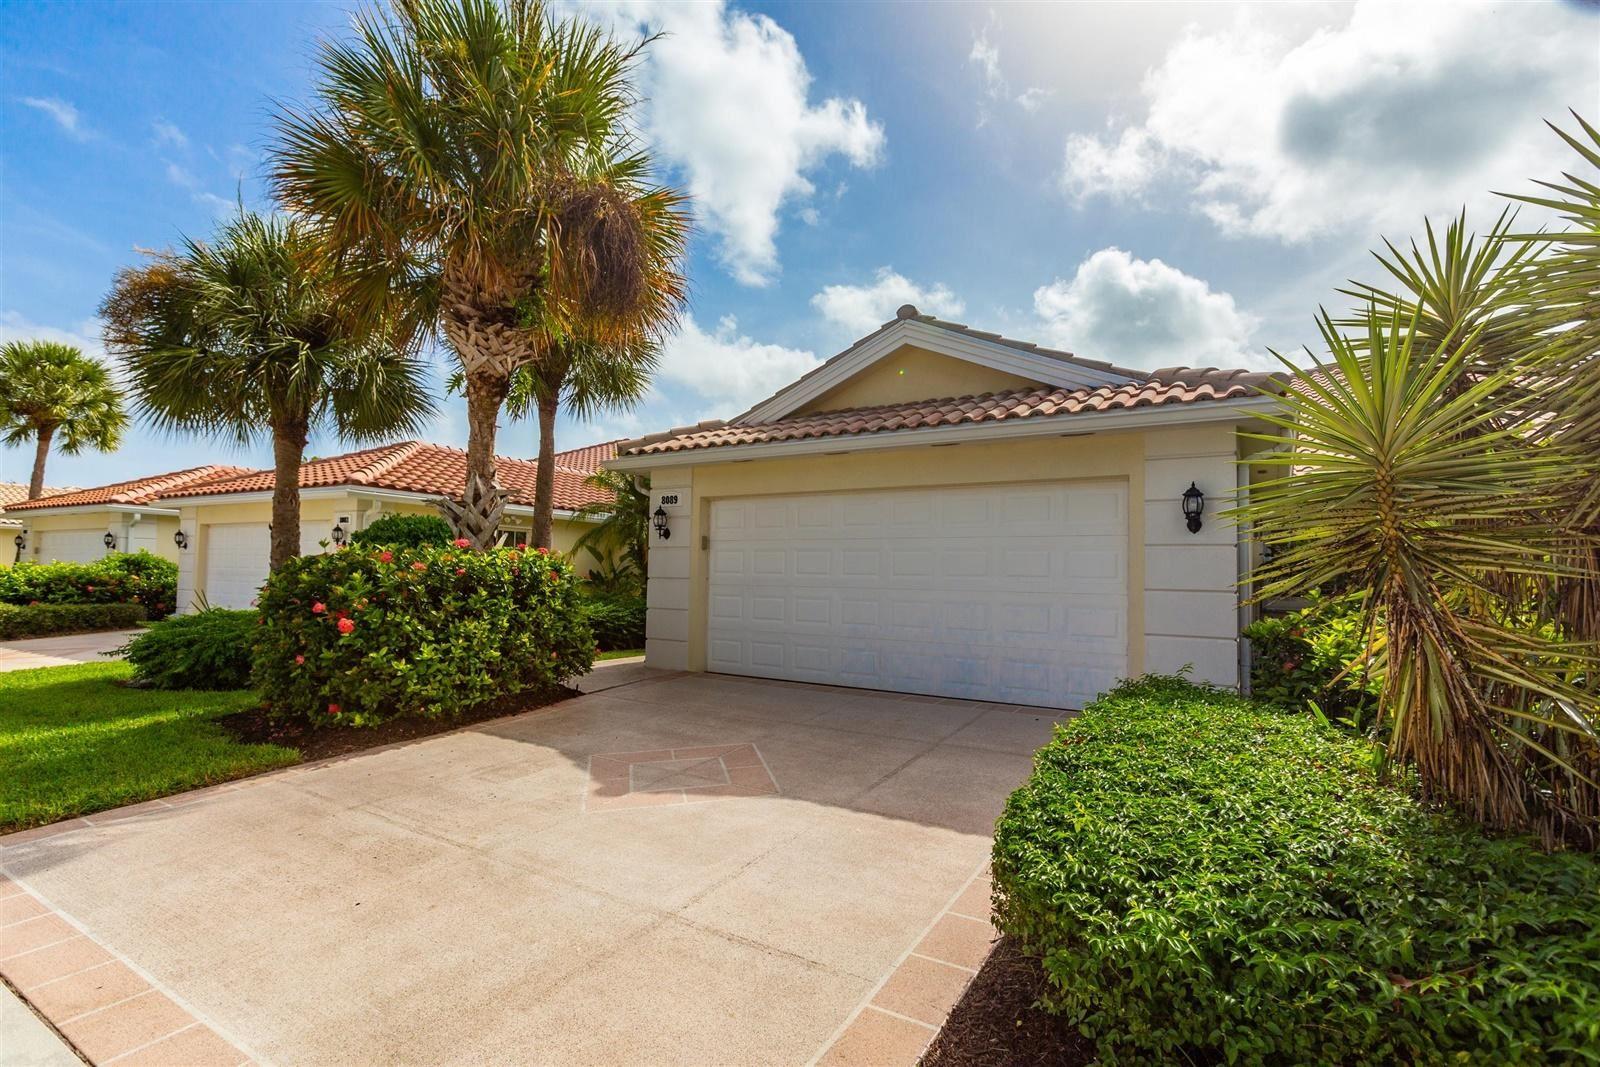 Photo of 8089 SE Peppercorn Court, Hobe Sound, FL 33455 (MLS # RX-10651830)